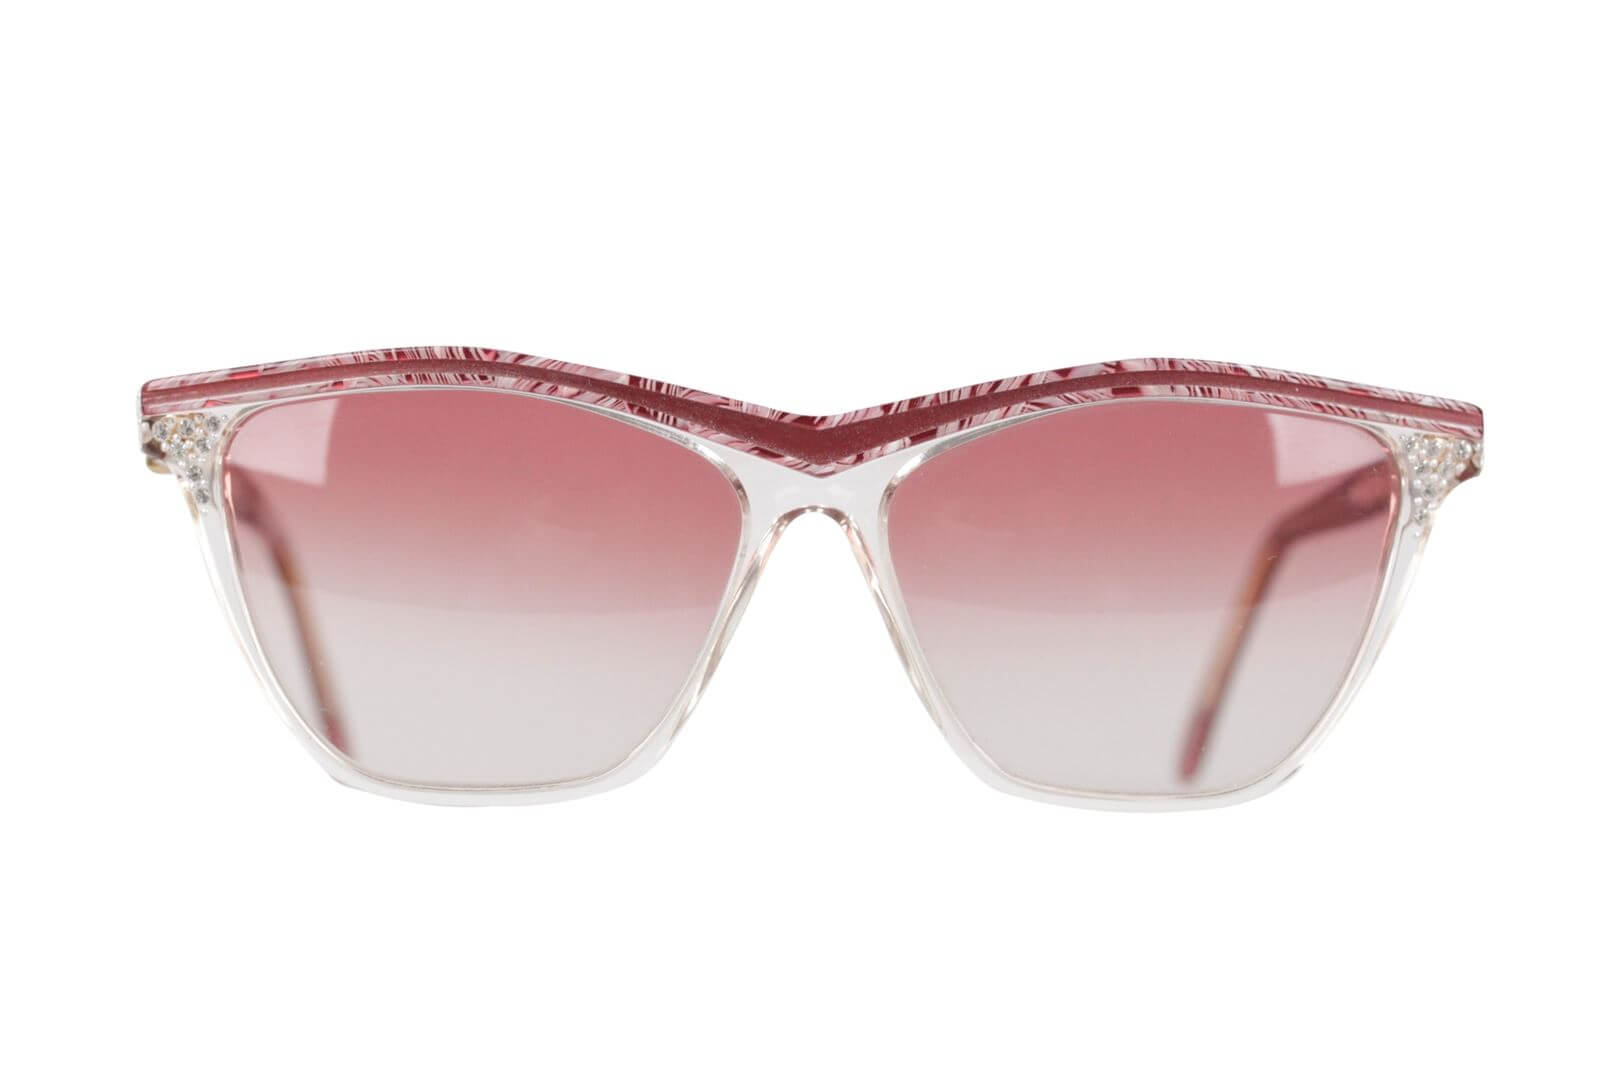 YSL Designer Sunglasses